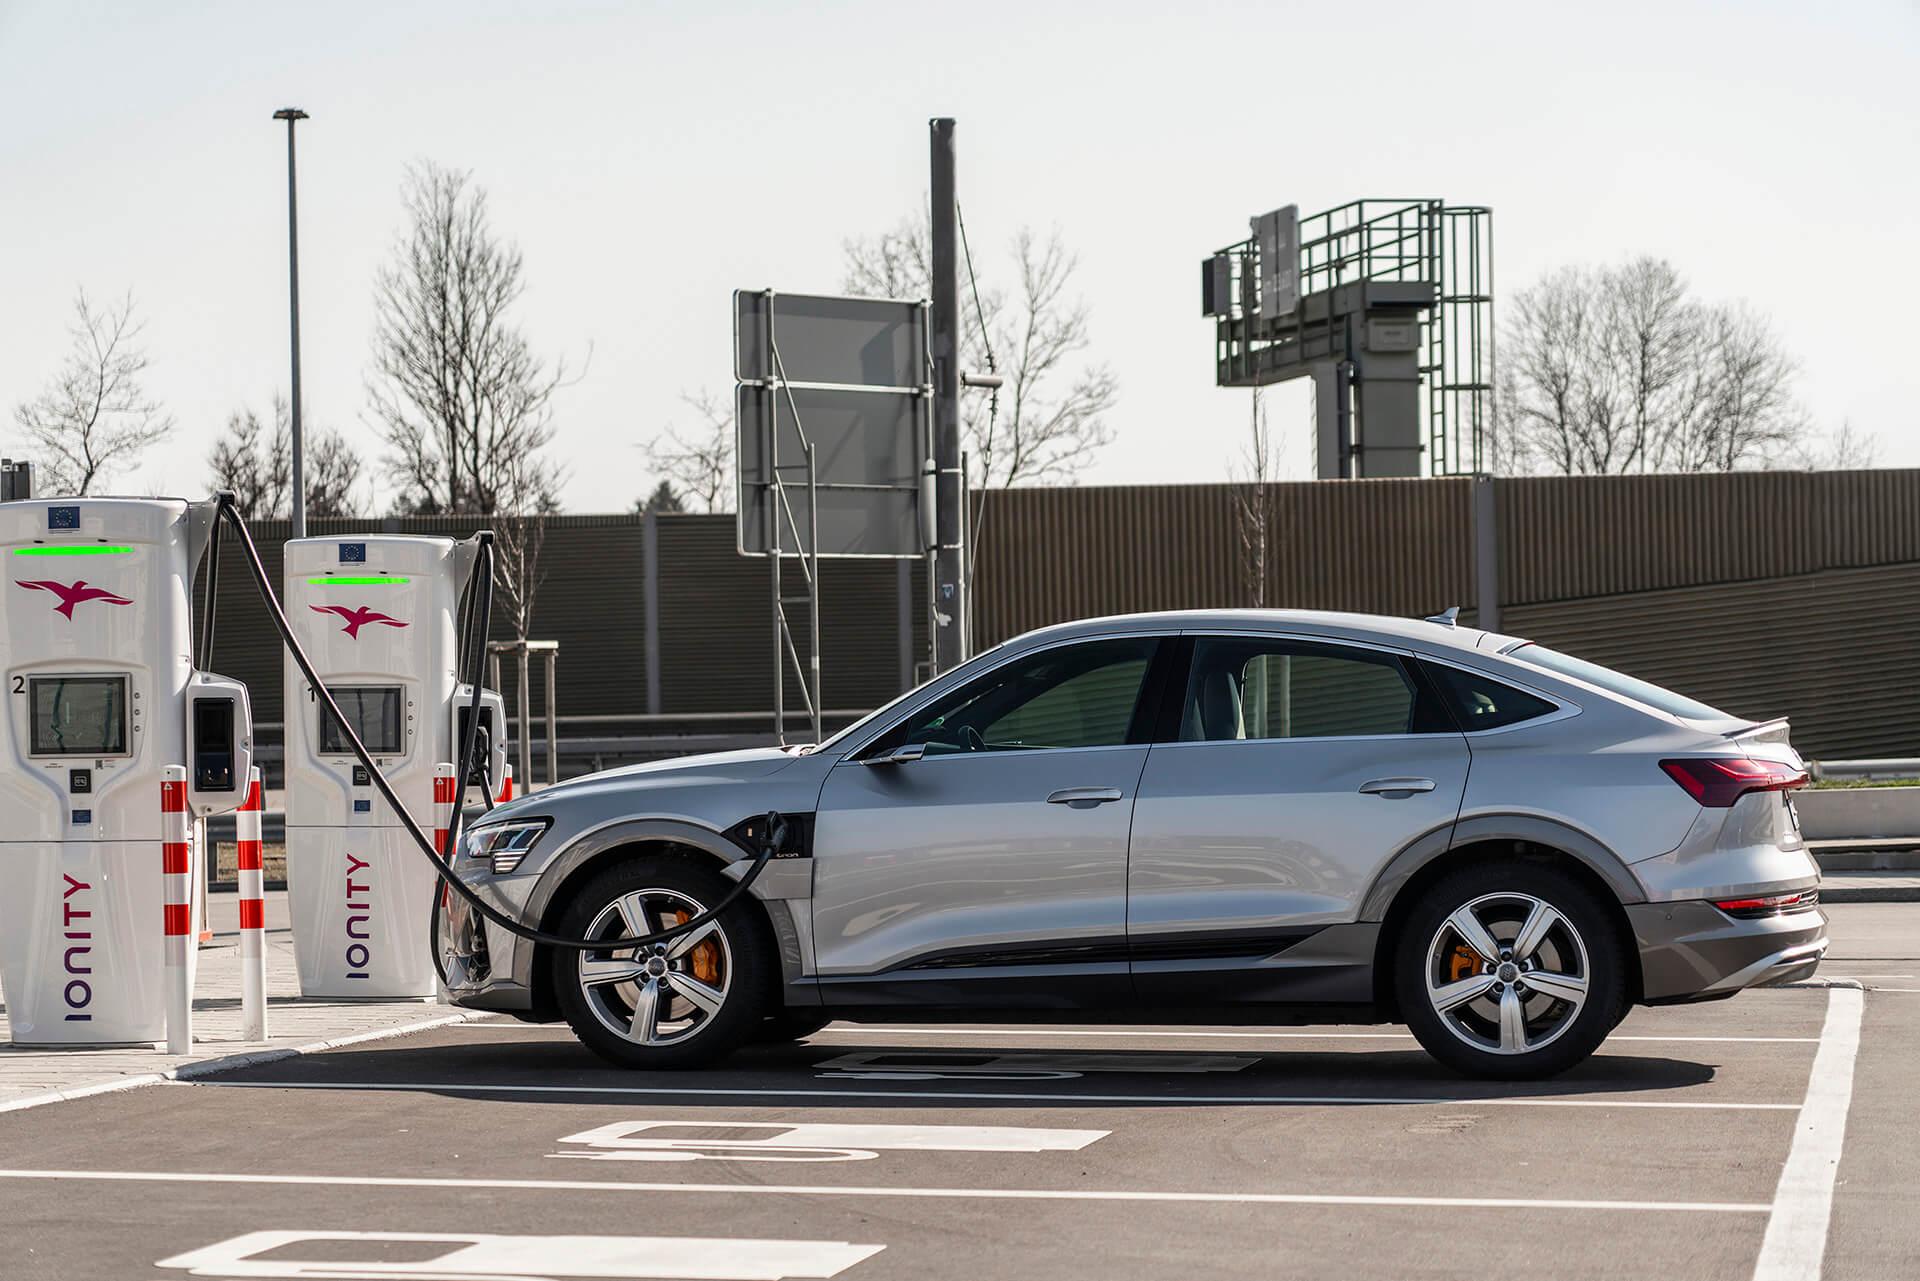 Audi e-tron σε σταθμό φόρτισης